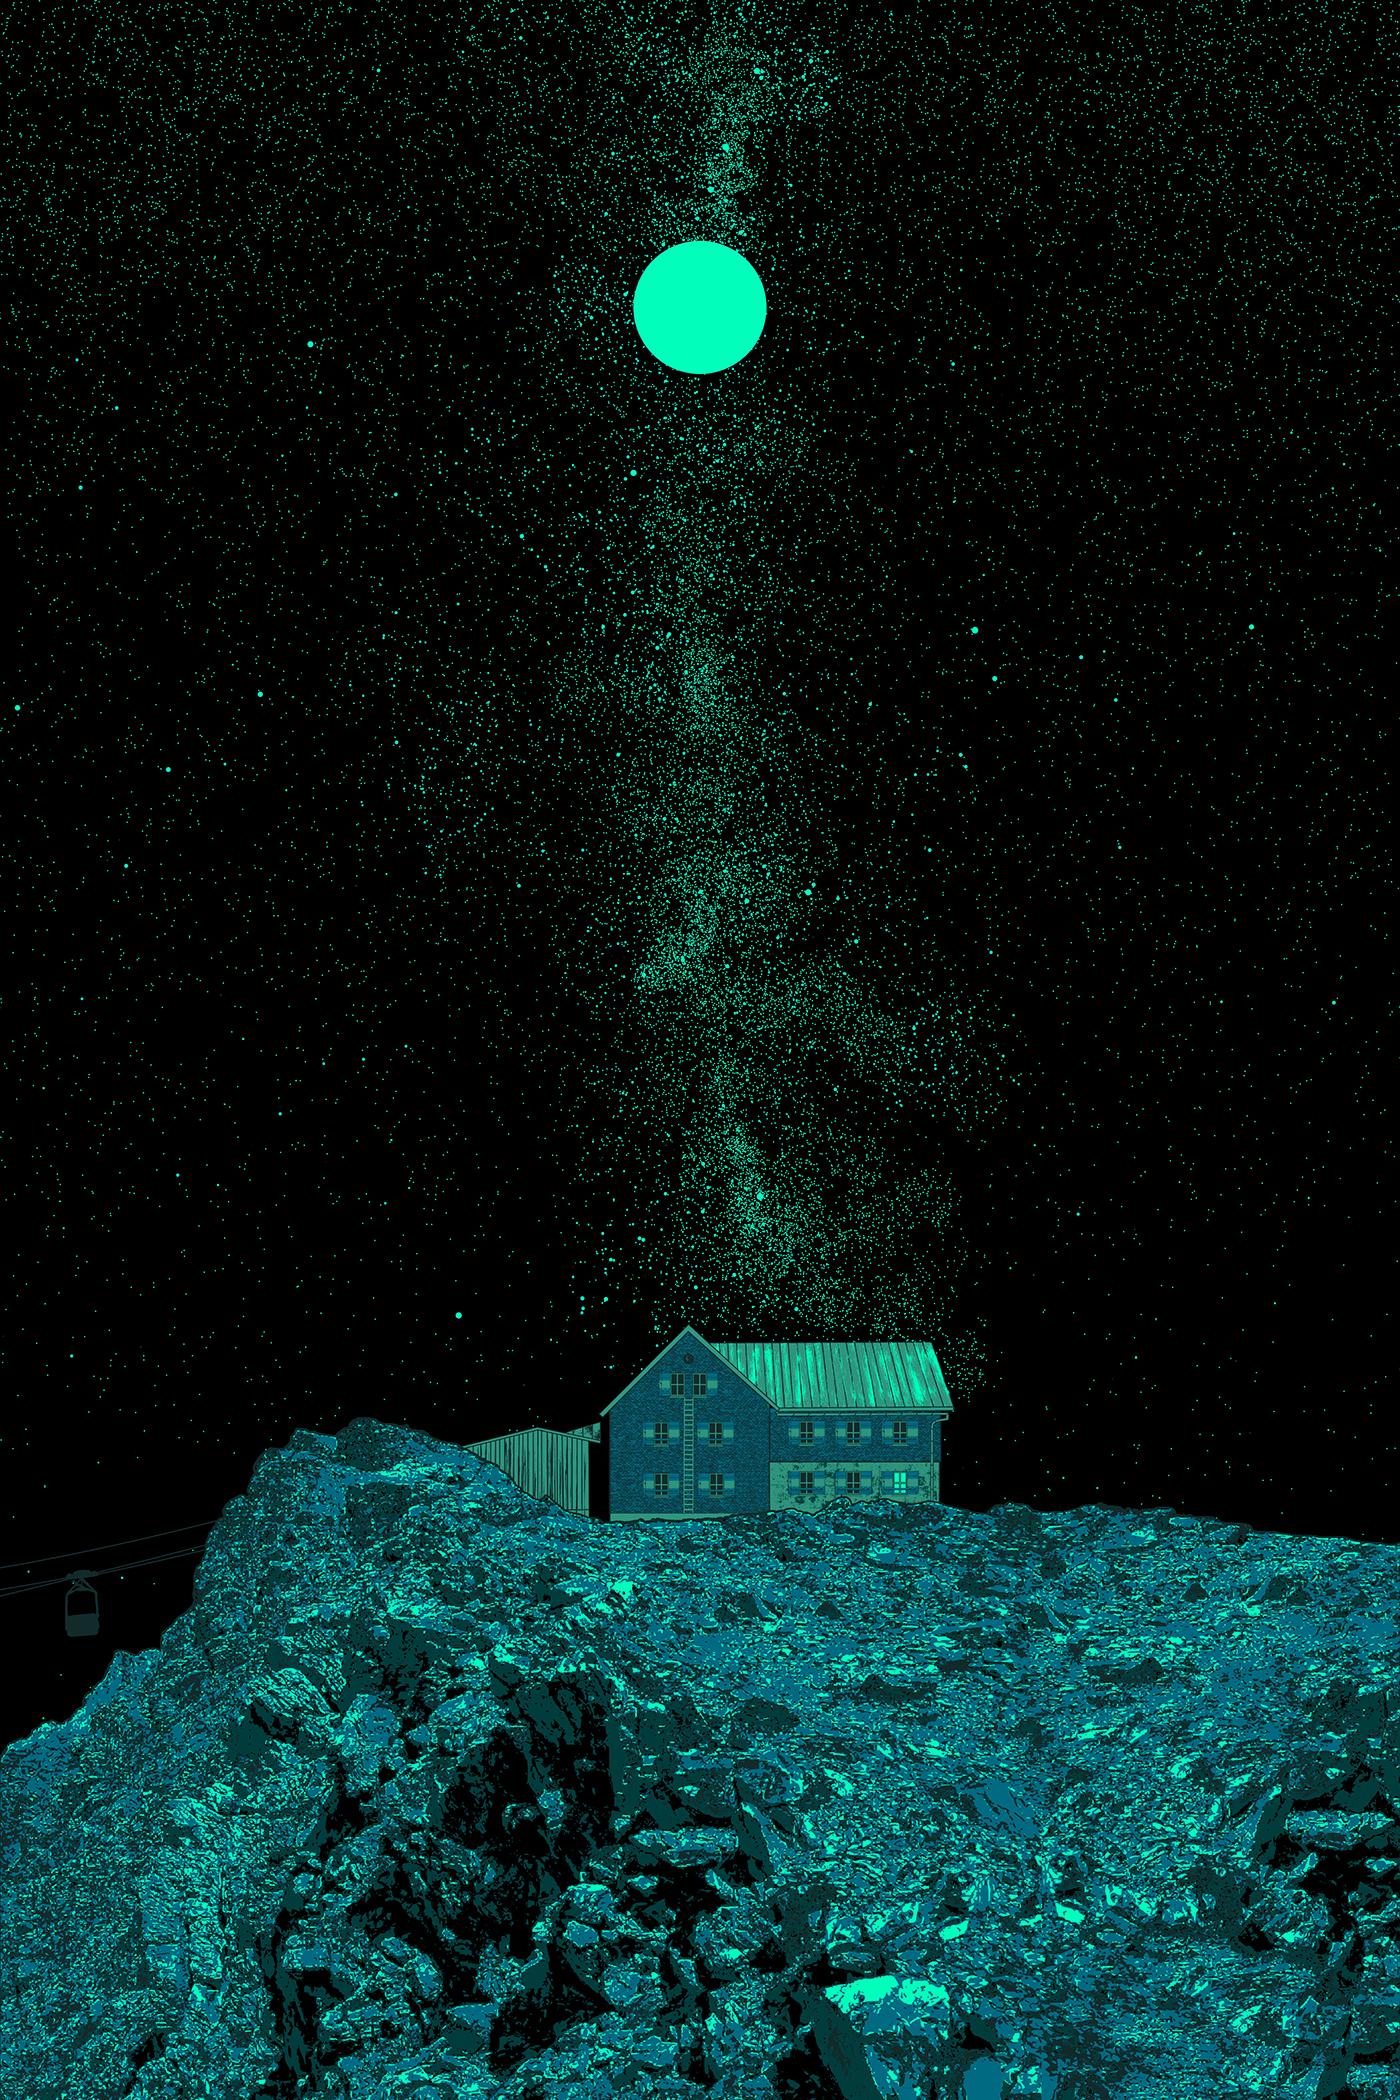 Image may contain: night